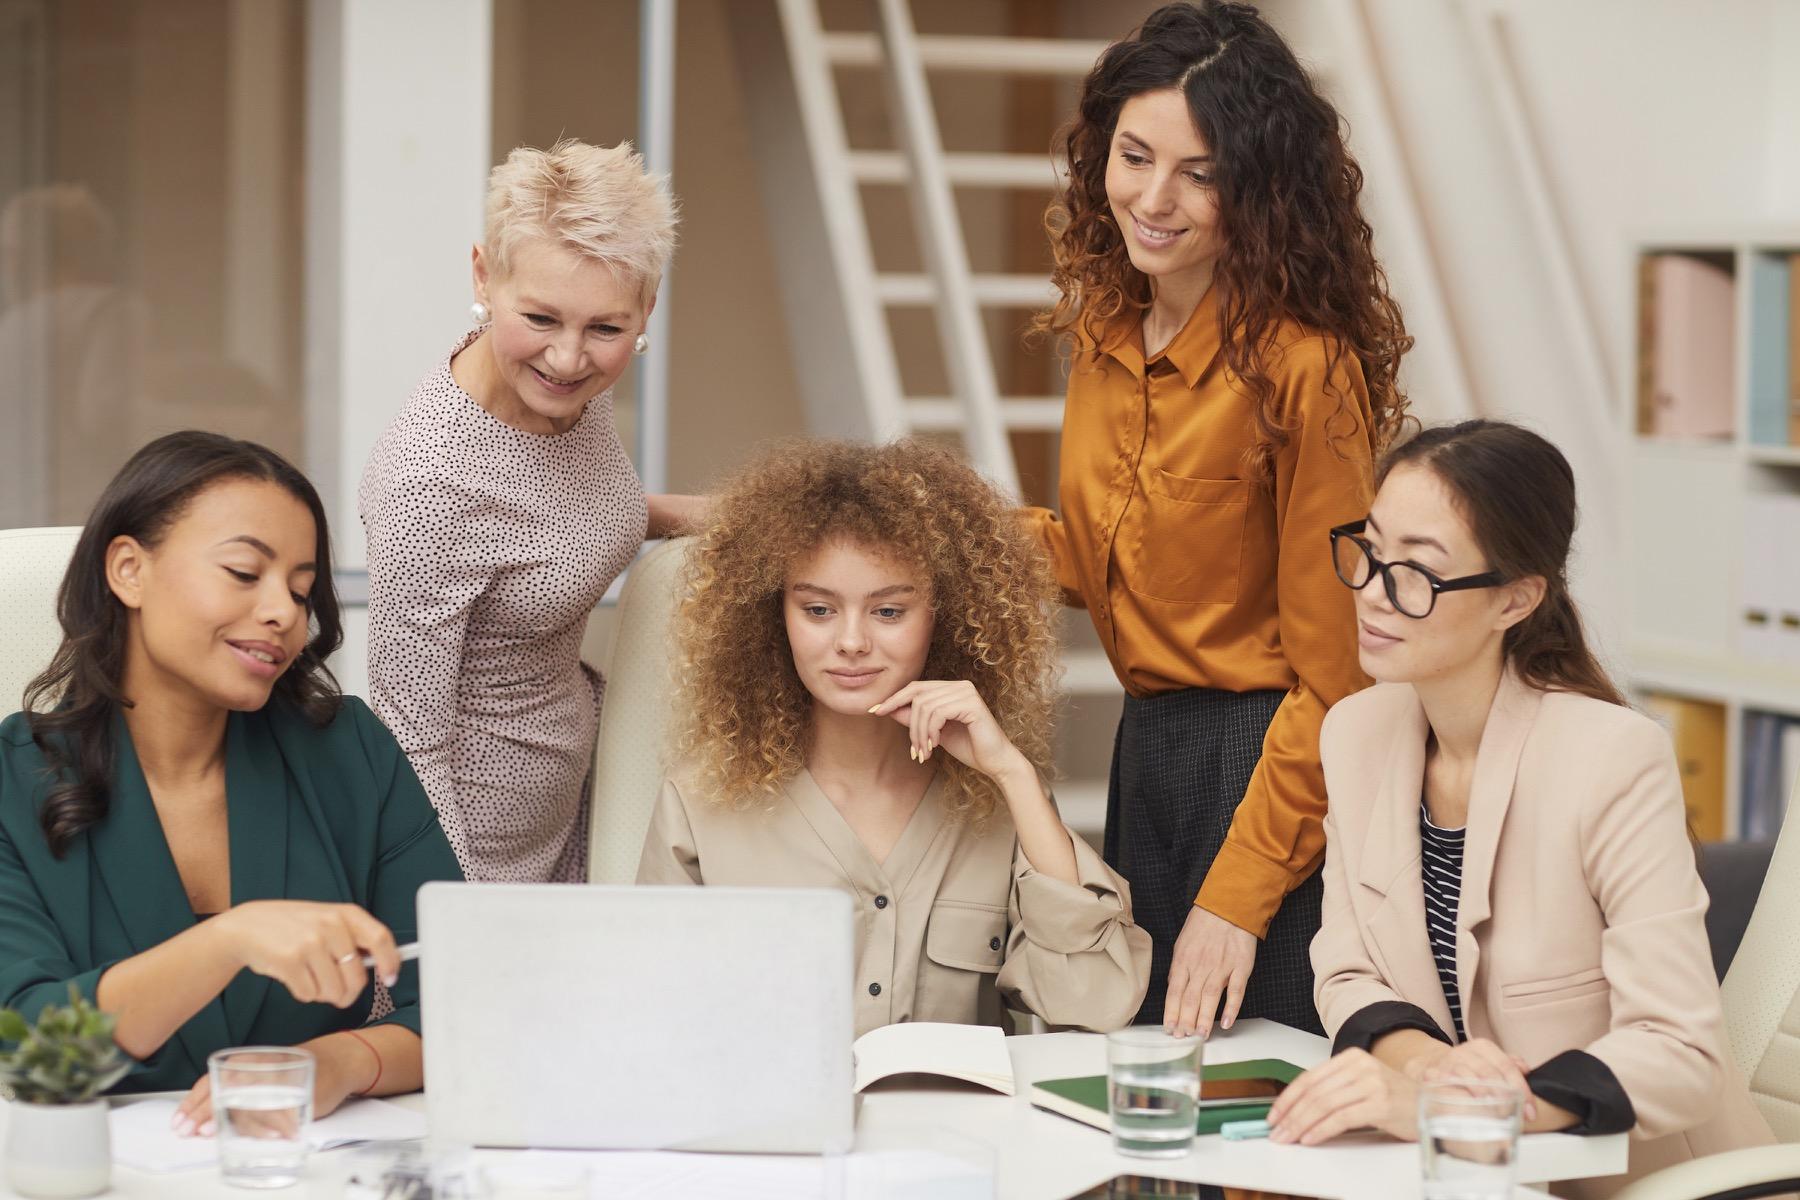 Women in Leadership 2020